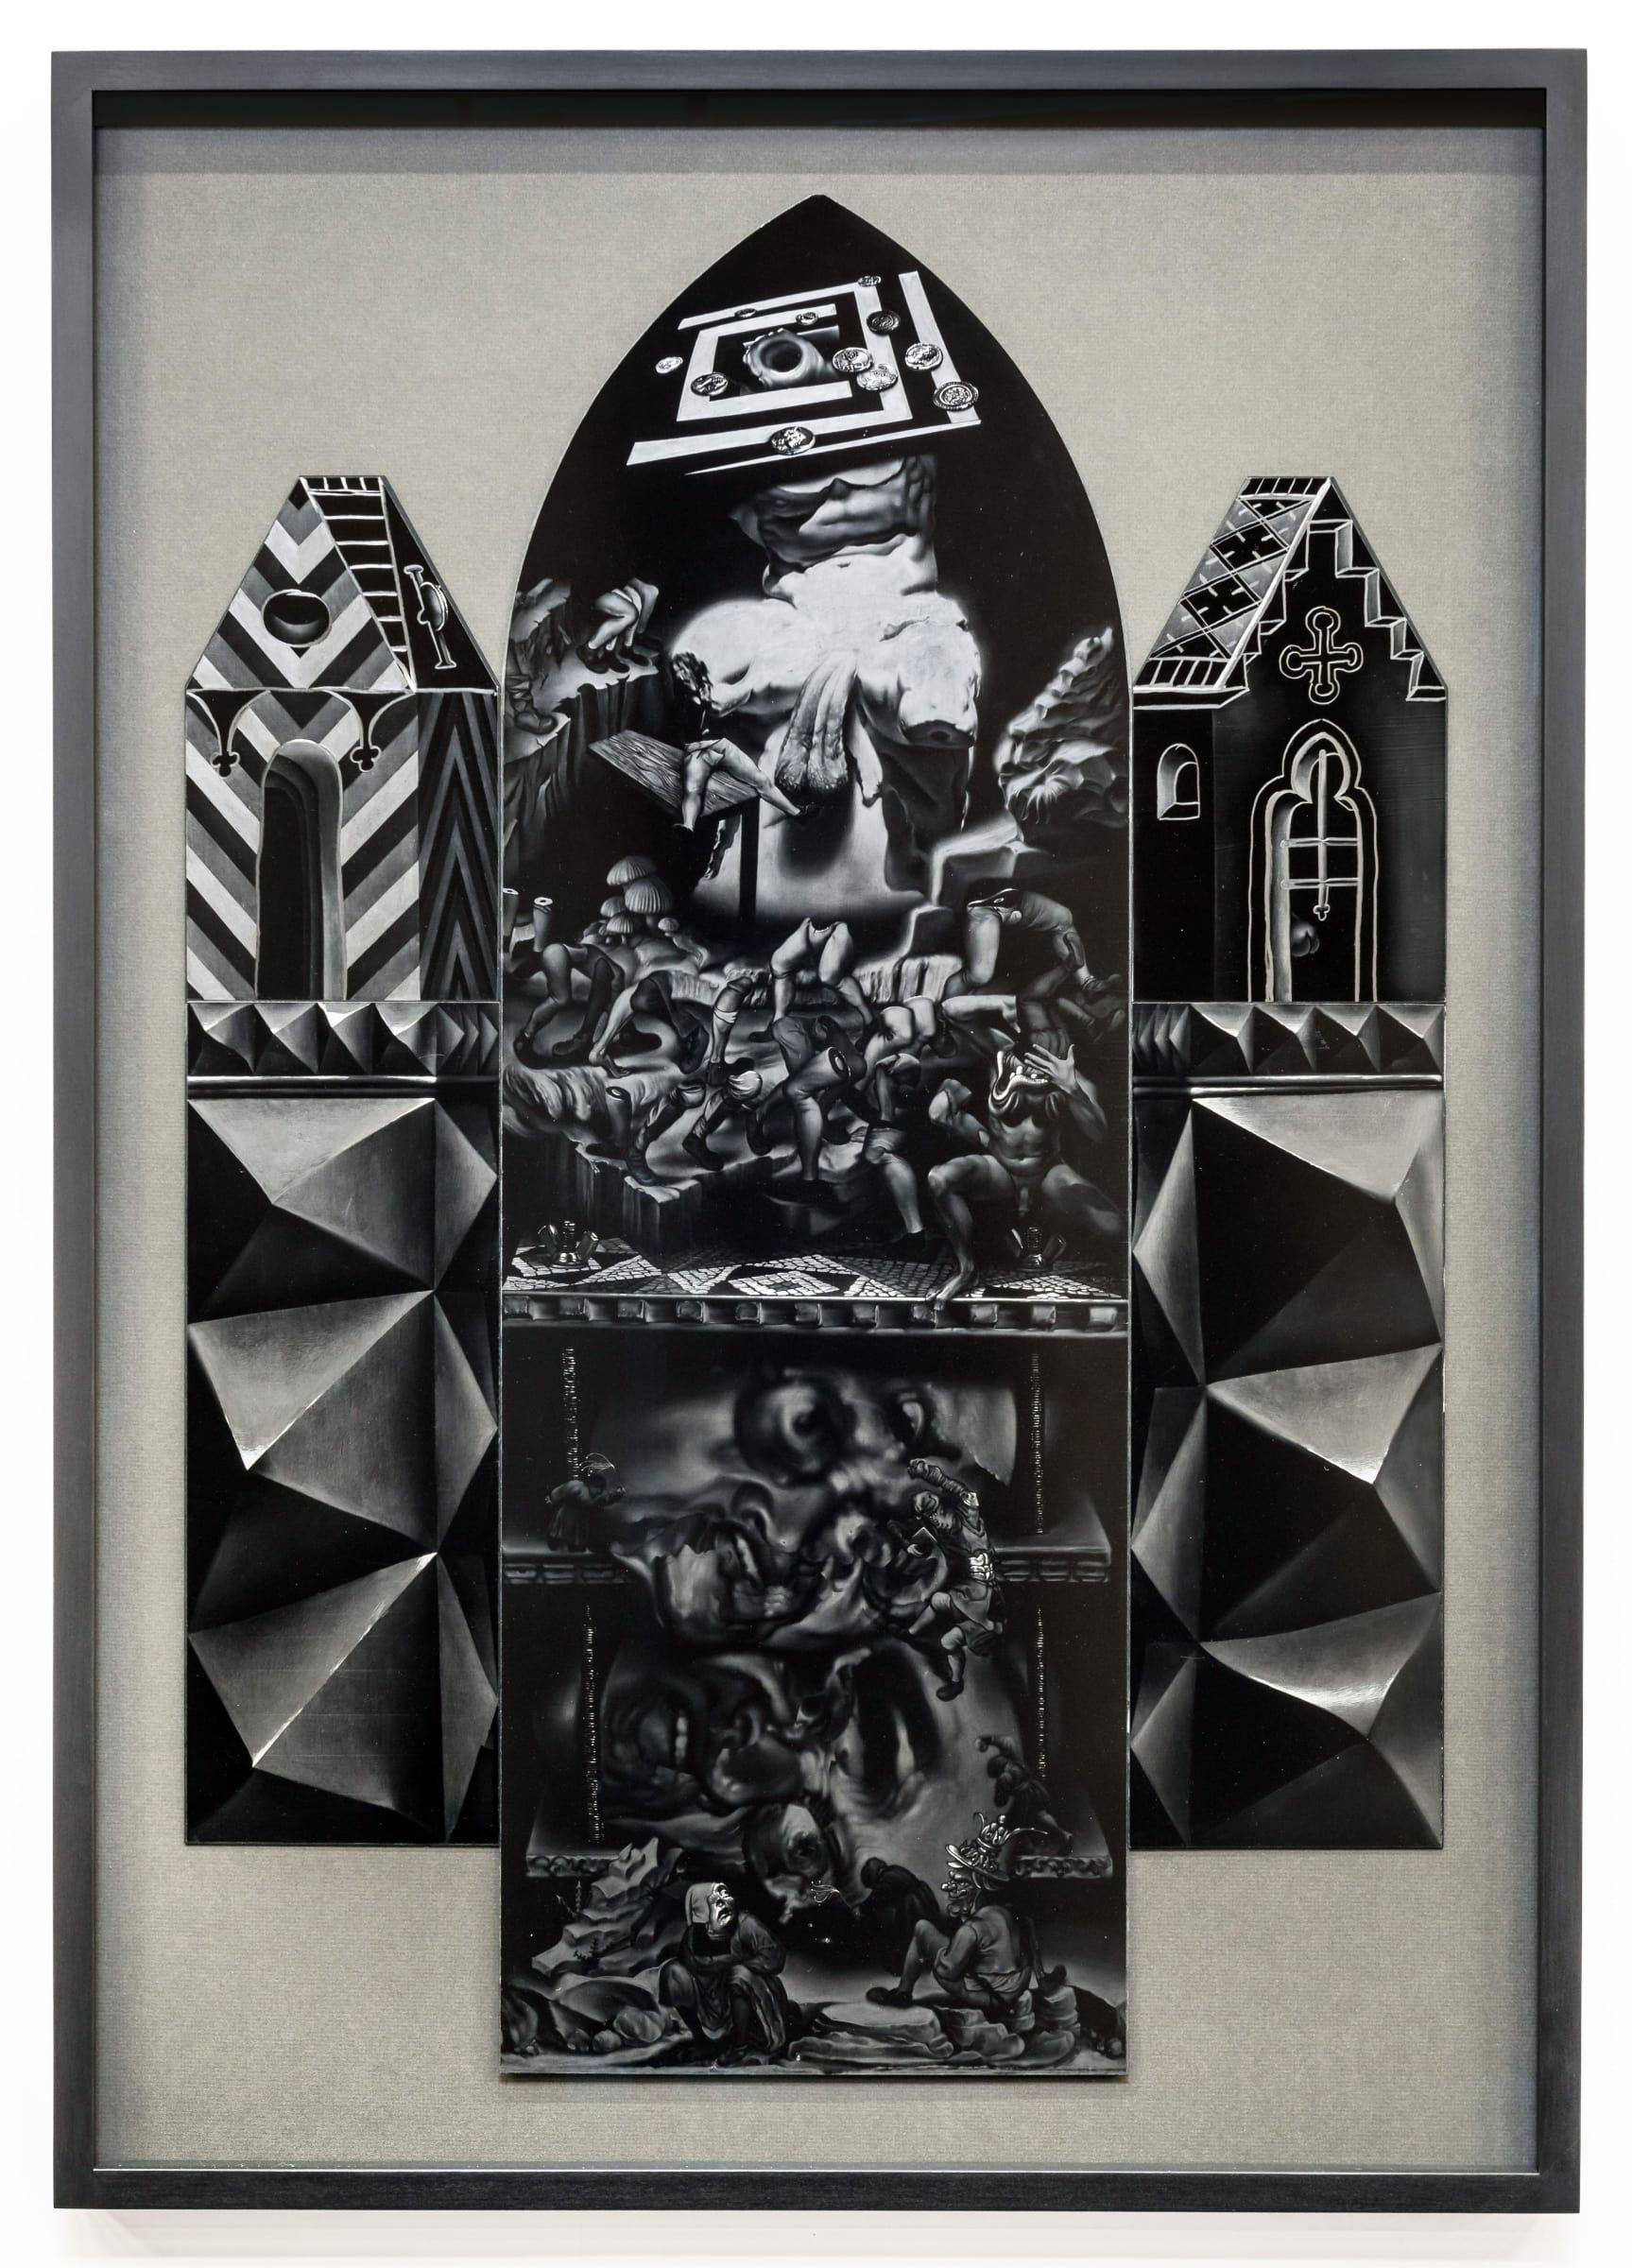 <span class=&#34;link fancybox-details-link&#34;><a href=&#34;/exhibitions/98/works/image2014/&#34;>View Detail Page</a></span><div id=&#34;artwork-panel-details&#34; class=&#34;standard-artwork-details&#34;><div class=&#34;artist&#34;><strong>Robert McNally</strong></div><div class=&#34;title&#34;><em>Peristalsis of weak and feeble</em>, 2016</div><div class=&#34;medium&#34;>Graphite on ultra-black carbon nanotube coated aluminium</div><div class=&#34;dimensions&#34;>102 x 72 cm<br /> 40 1/8 x 28 3/8 in<br /> (Framed)</div><div class=&#34;dimensions&#34;><em>Courtesy of David Risley gallery Copenhagen</em></div></div>